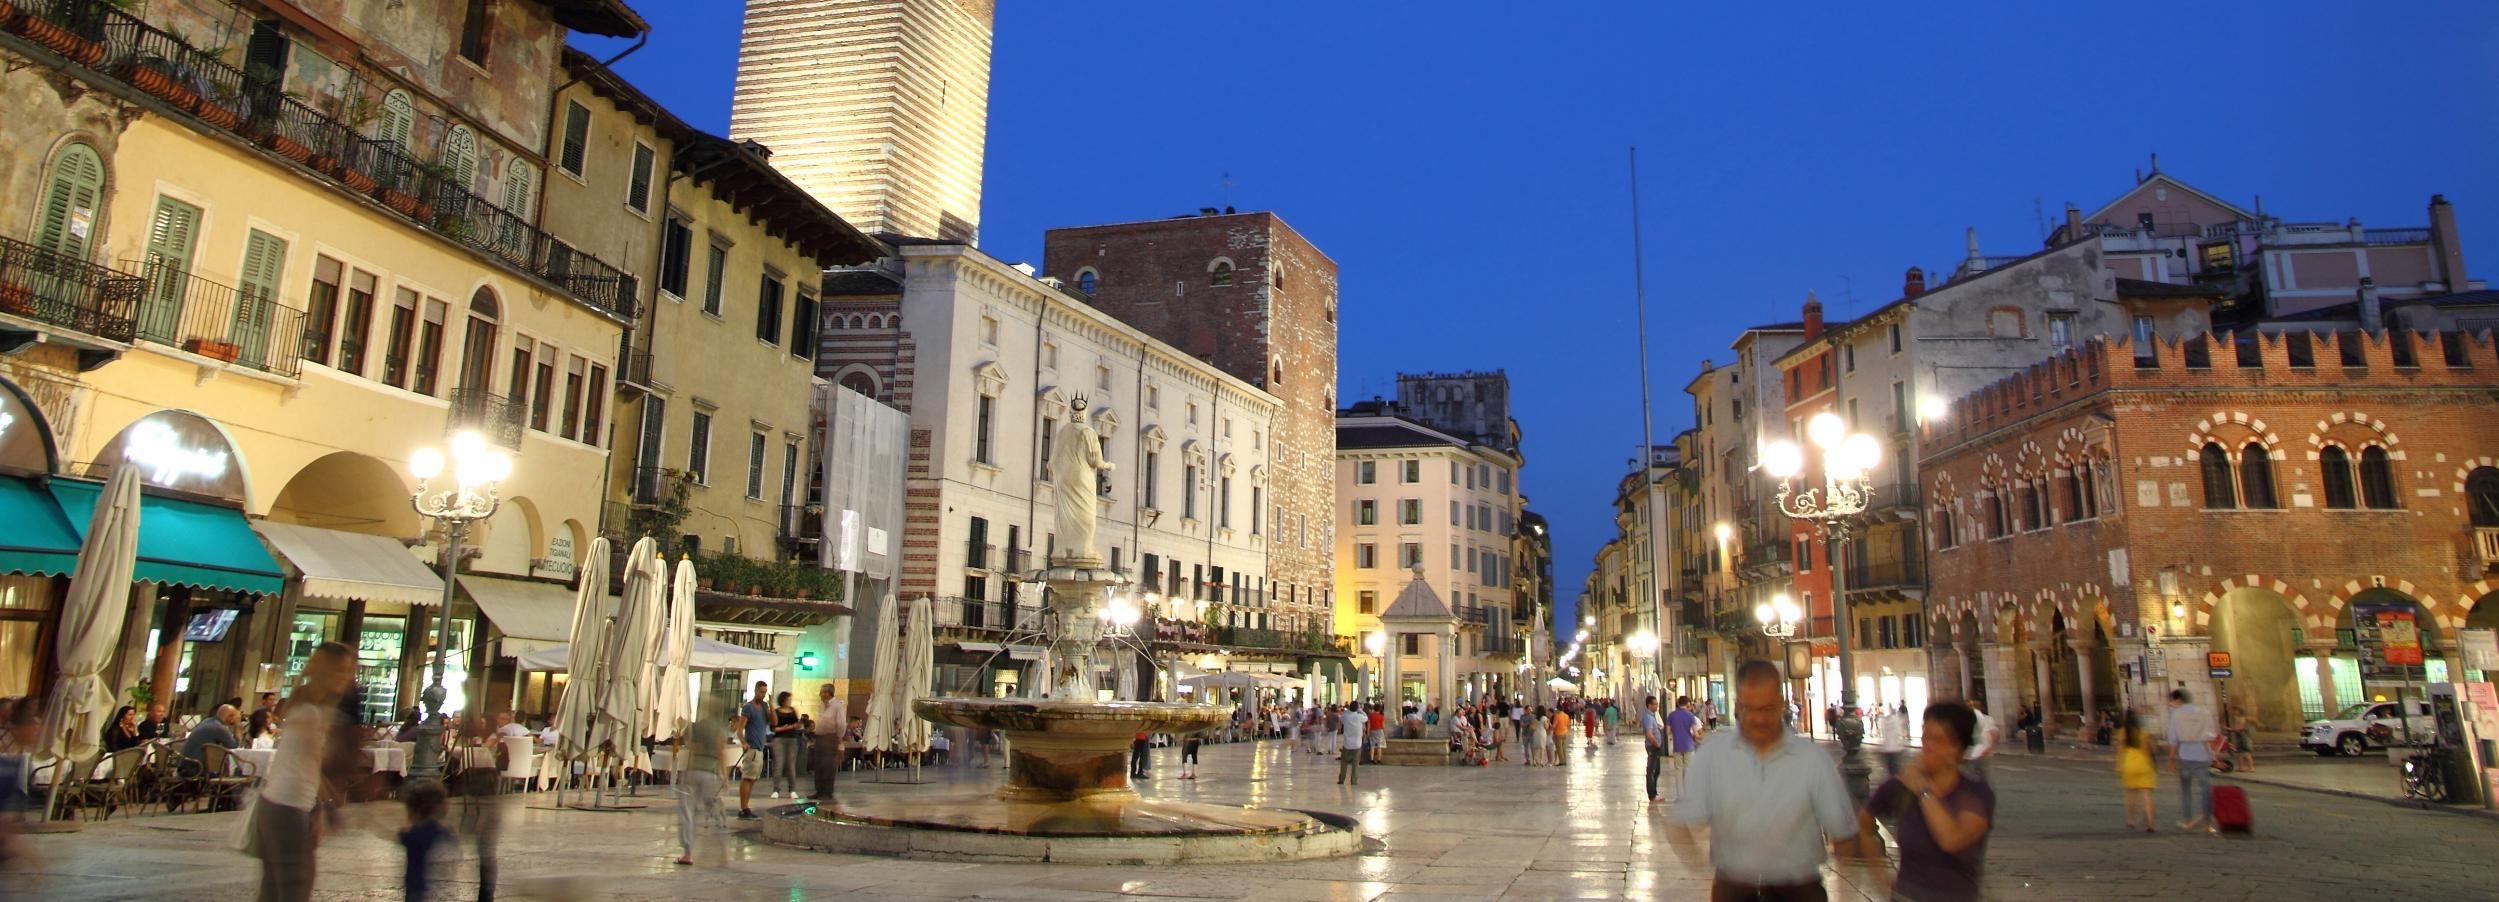 Verona 1 Day Individual Excursion From Milan